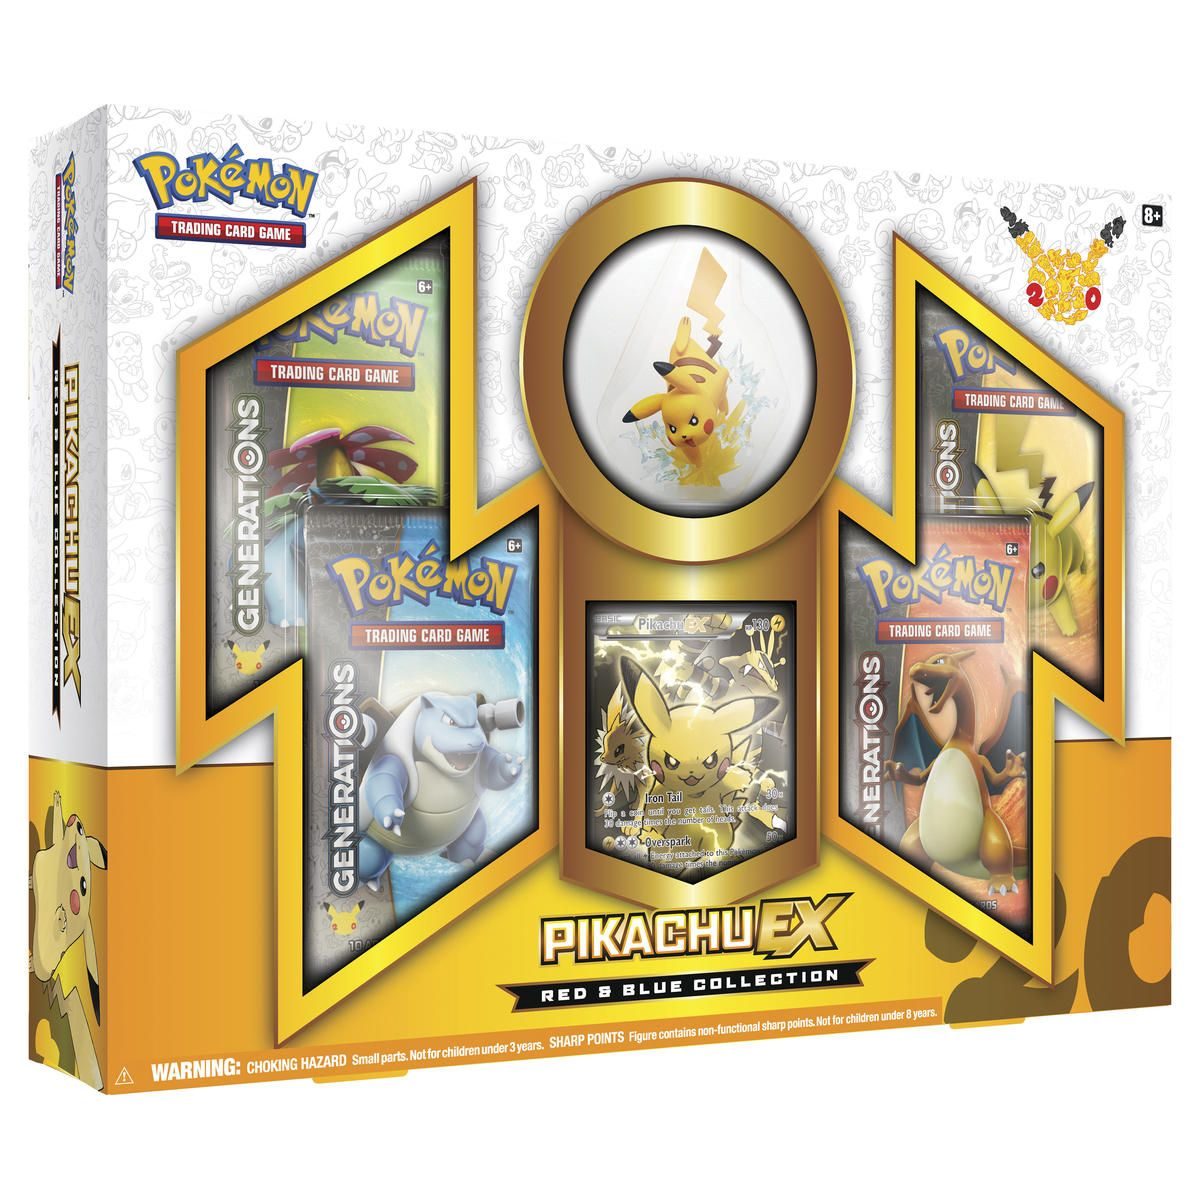 Pokemon trading card game pikachu ex collection kmart i like pokemon trading card game pikachu ex collection kmart bookmarktalkfo Images